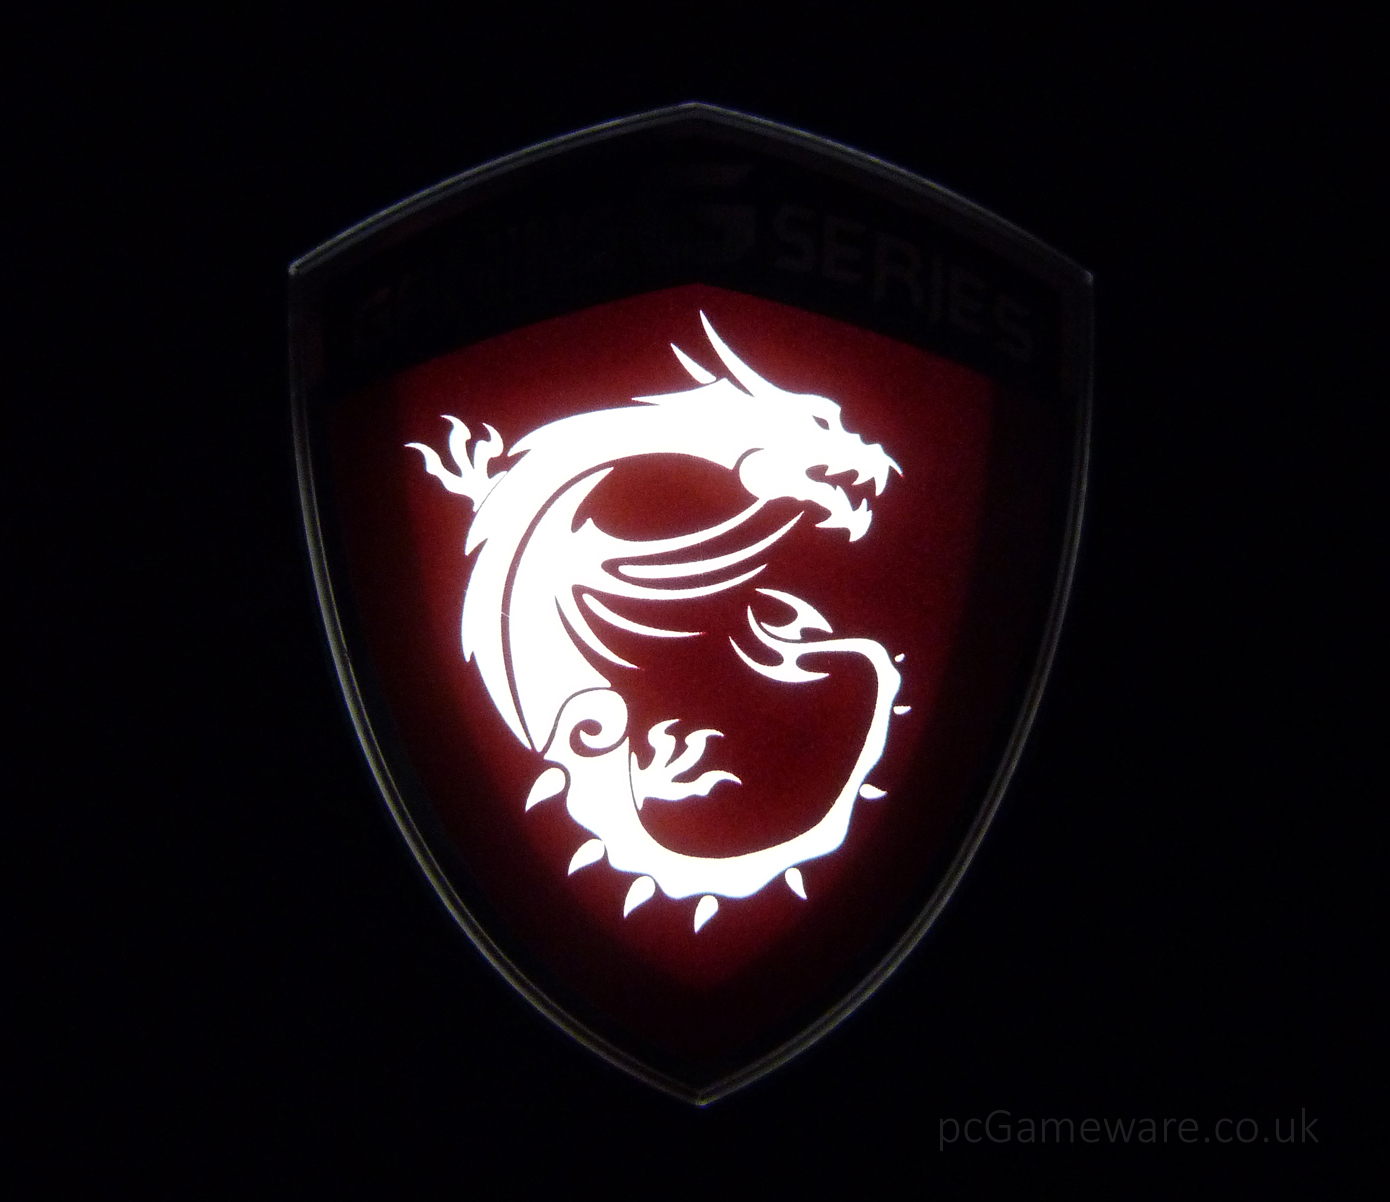 46 msi dragon wallpaper hd on wallpapersafari - Gaming logo wallpaper ...